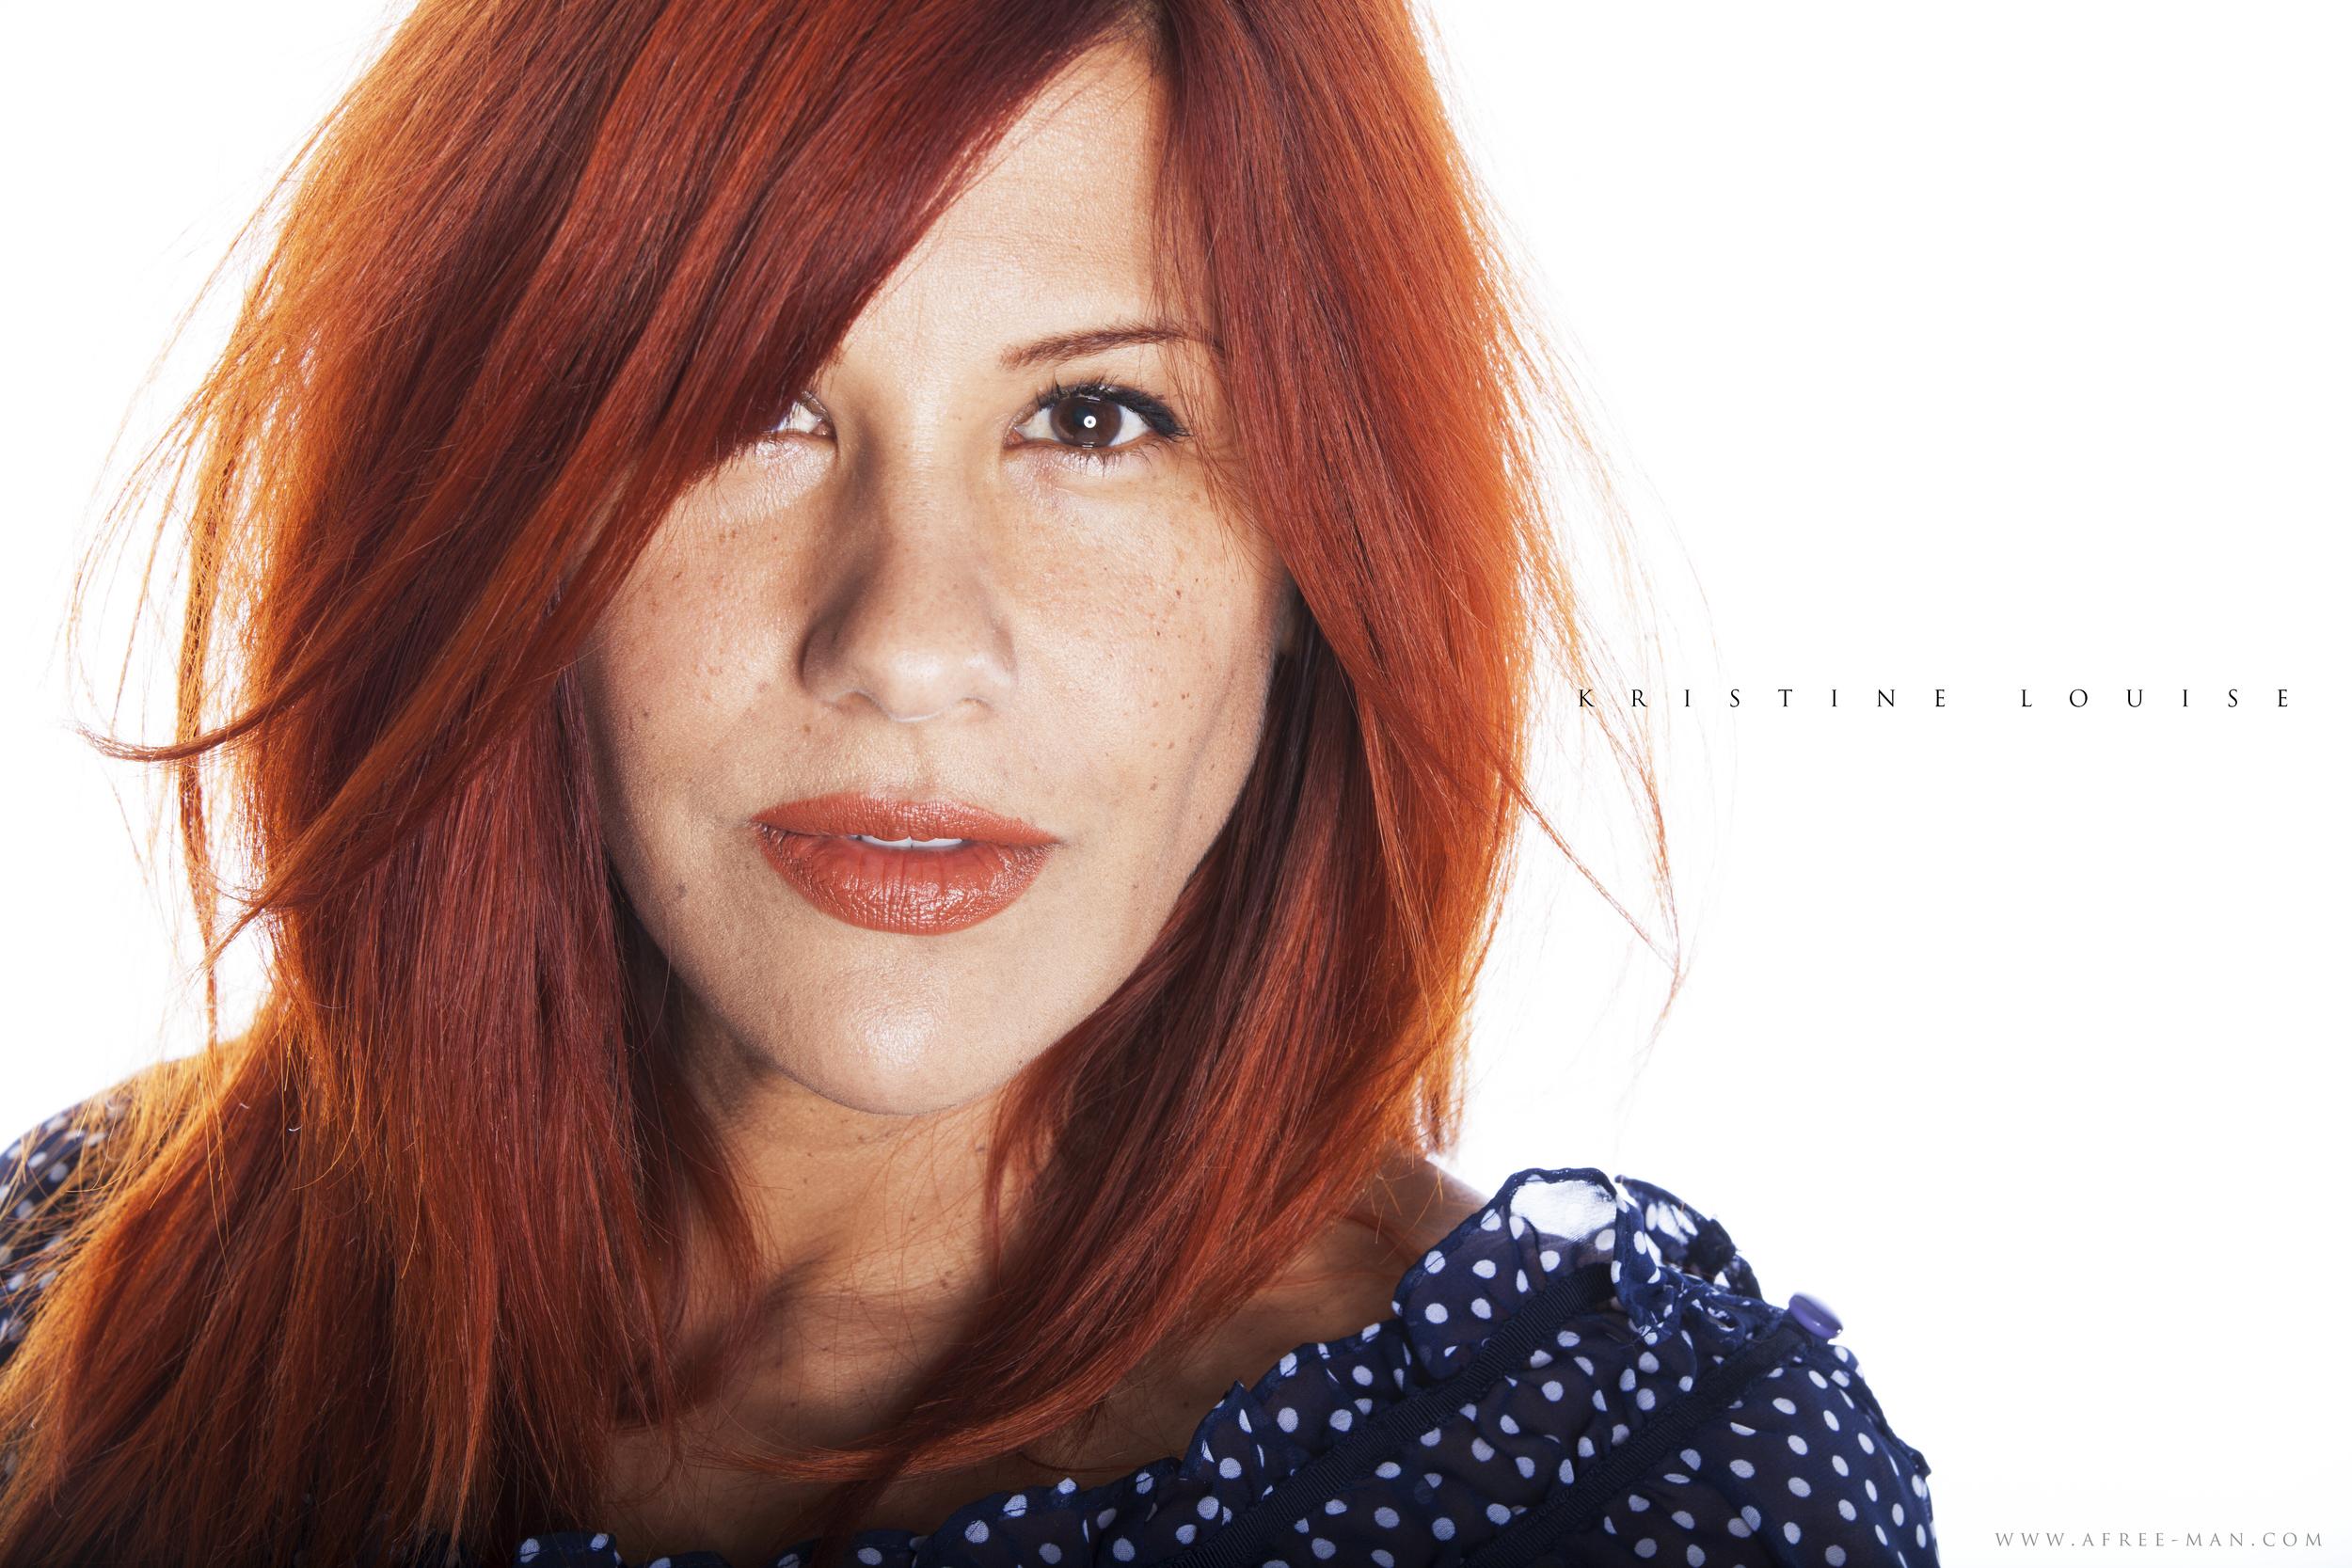 Kristine Louise